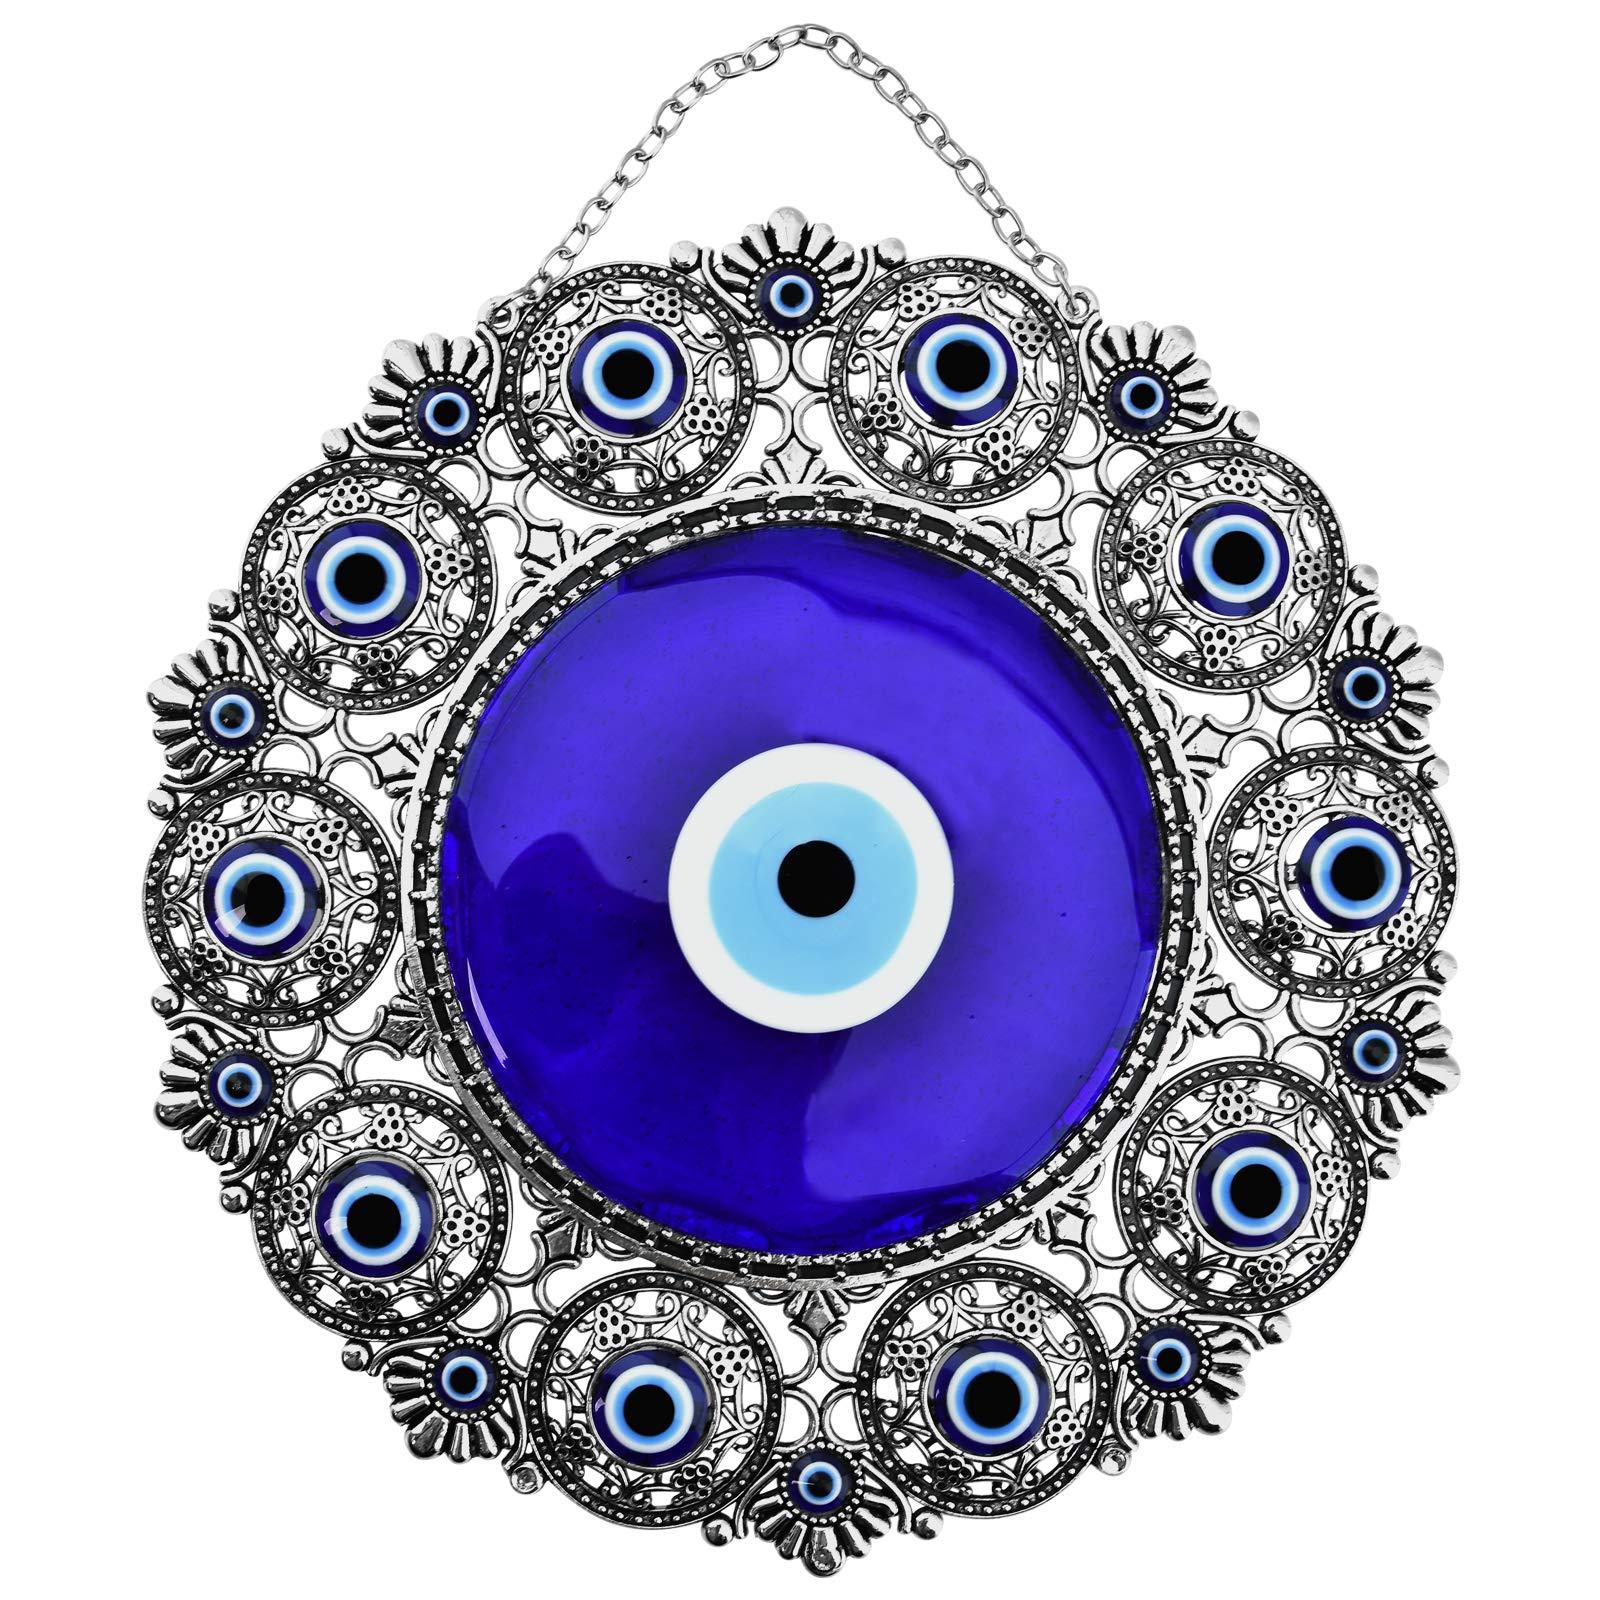 Erbulus Turkish Big Glass Turkish Evil Eye Bead Home Protection Charm-Hanging Ornament Wall Decor (Blue Eye) (Blue Eye) by Erbulus